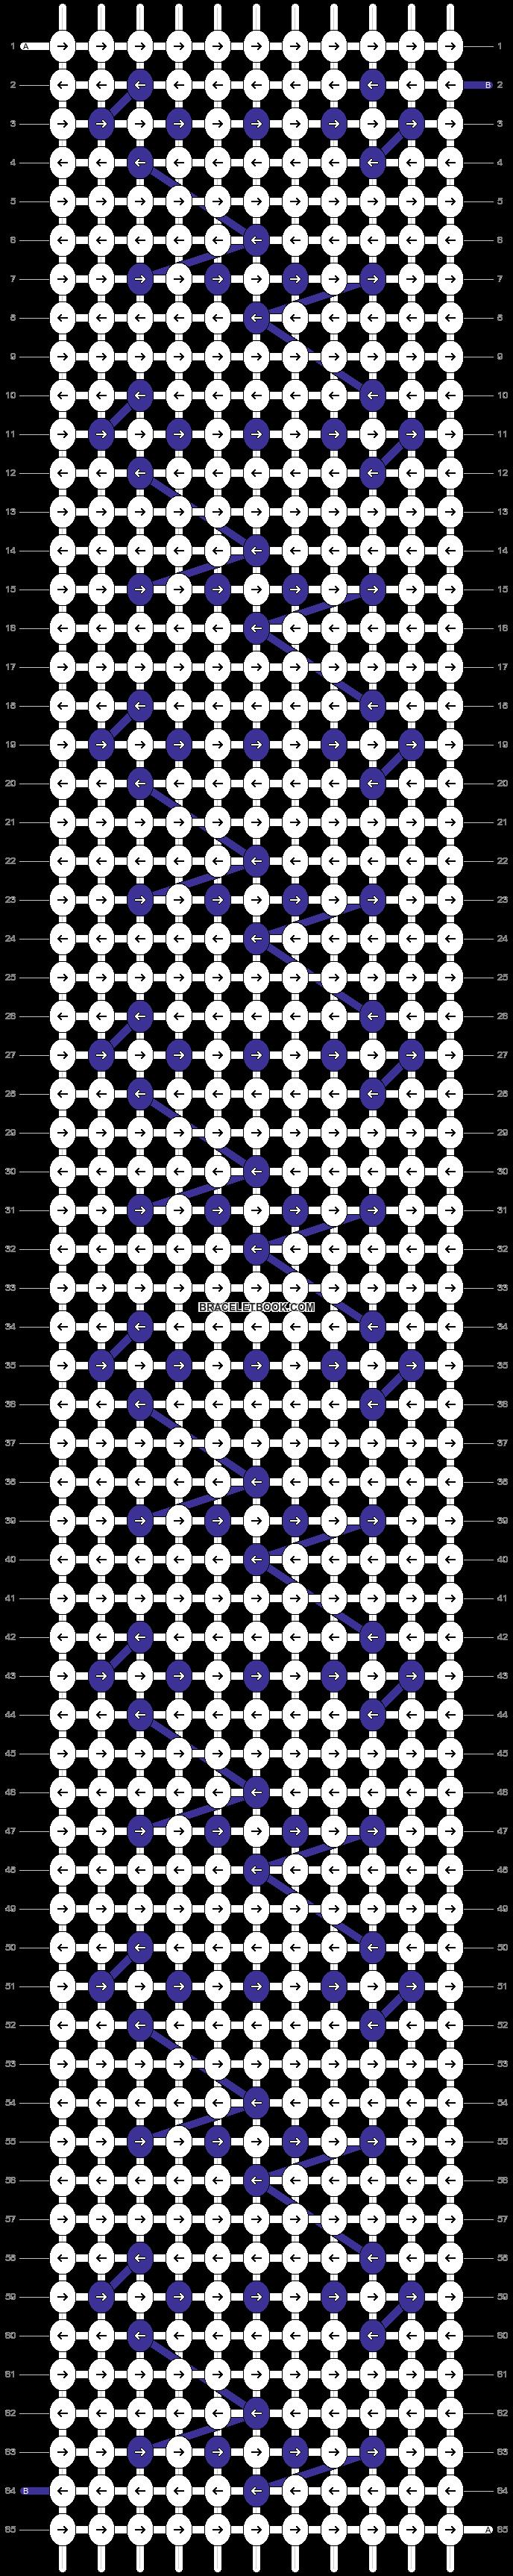 Alpha pattern #64239 pattern